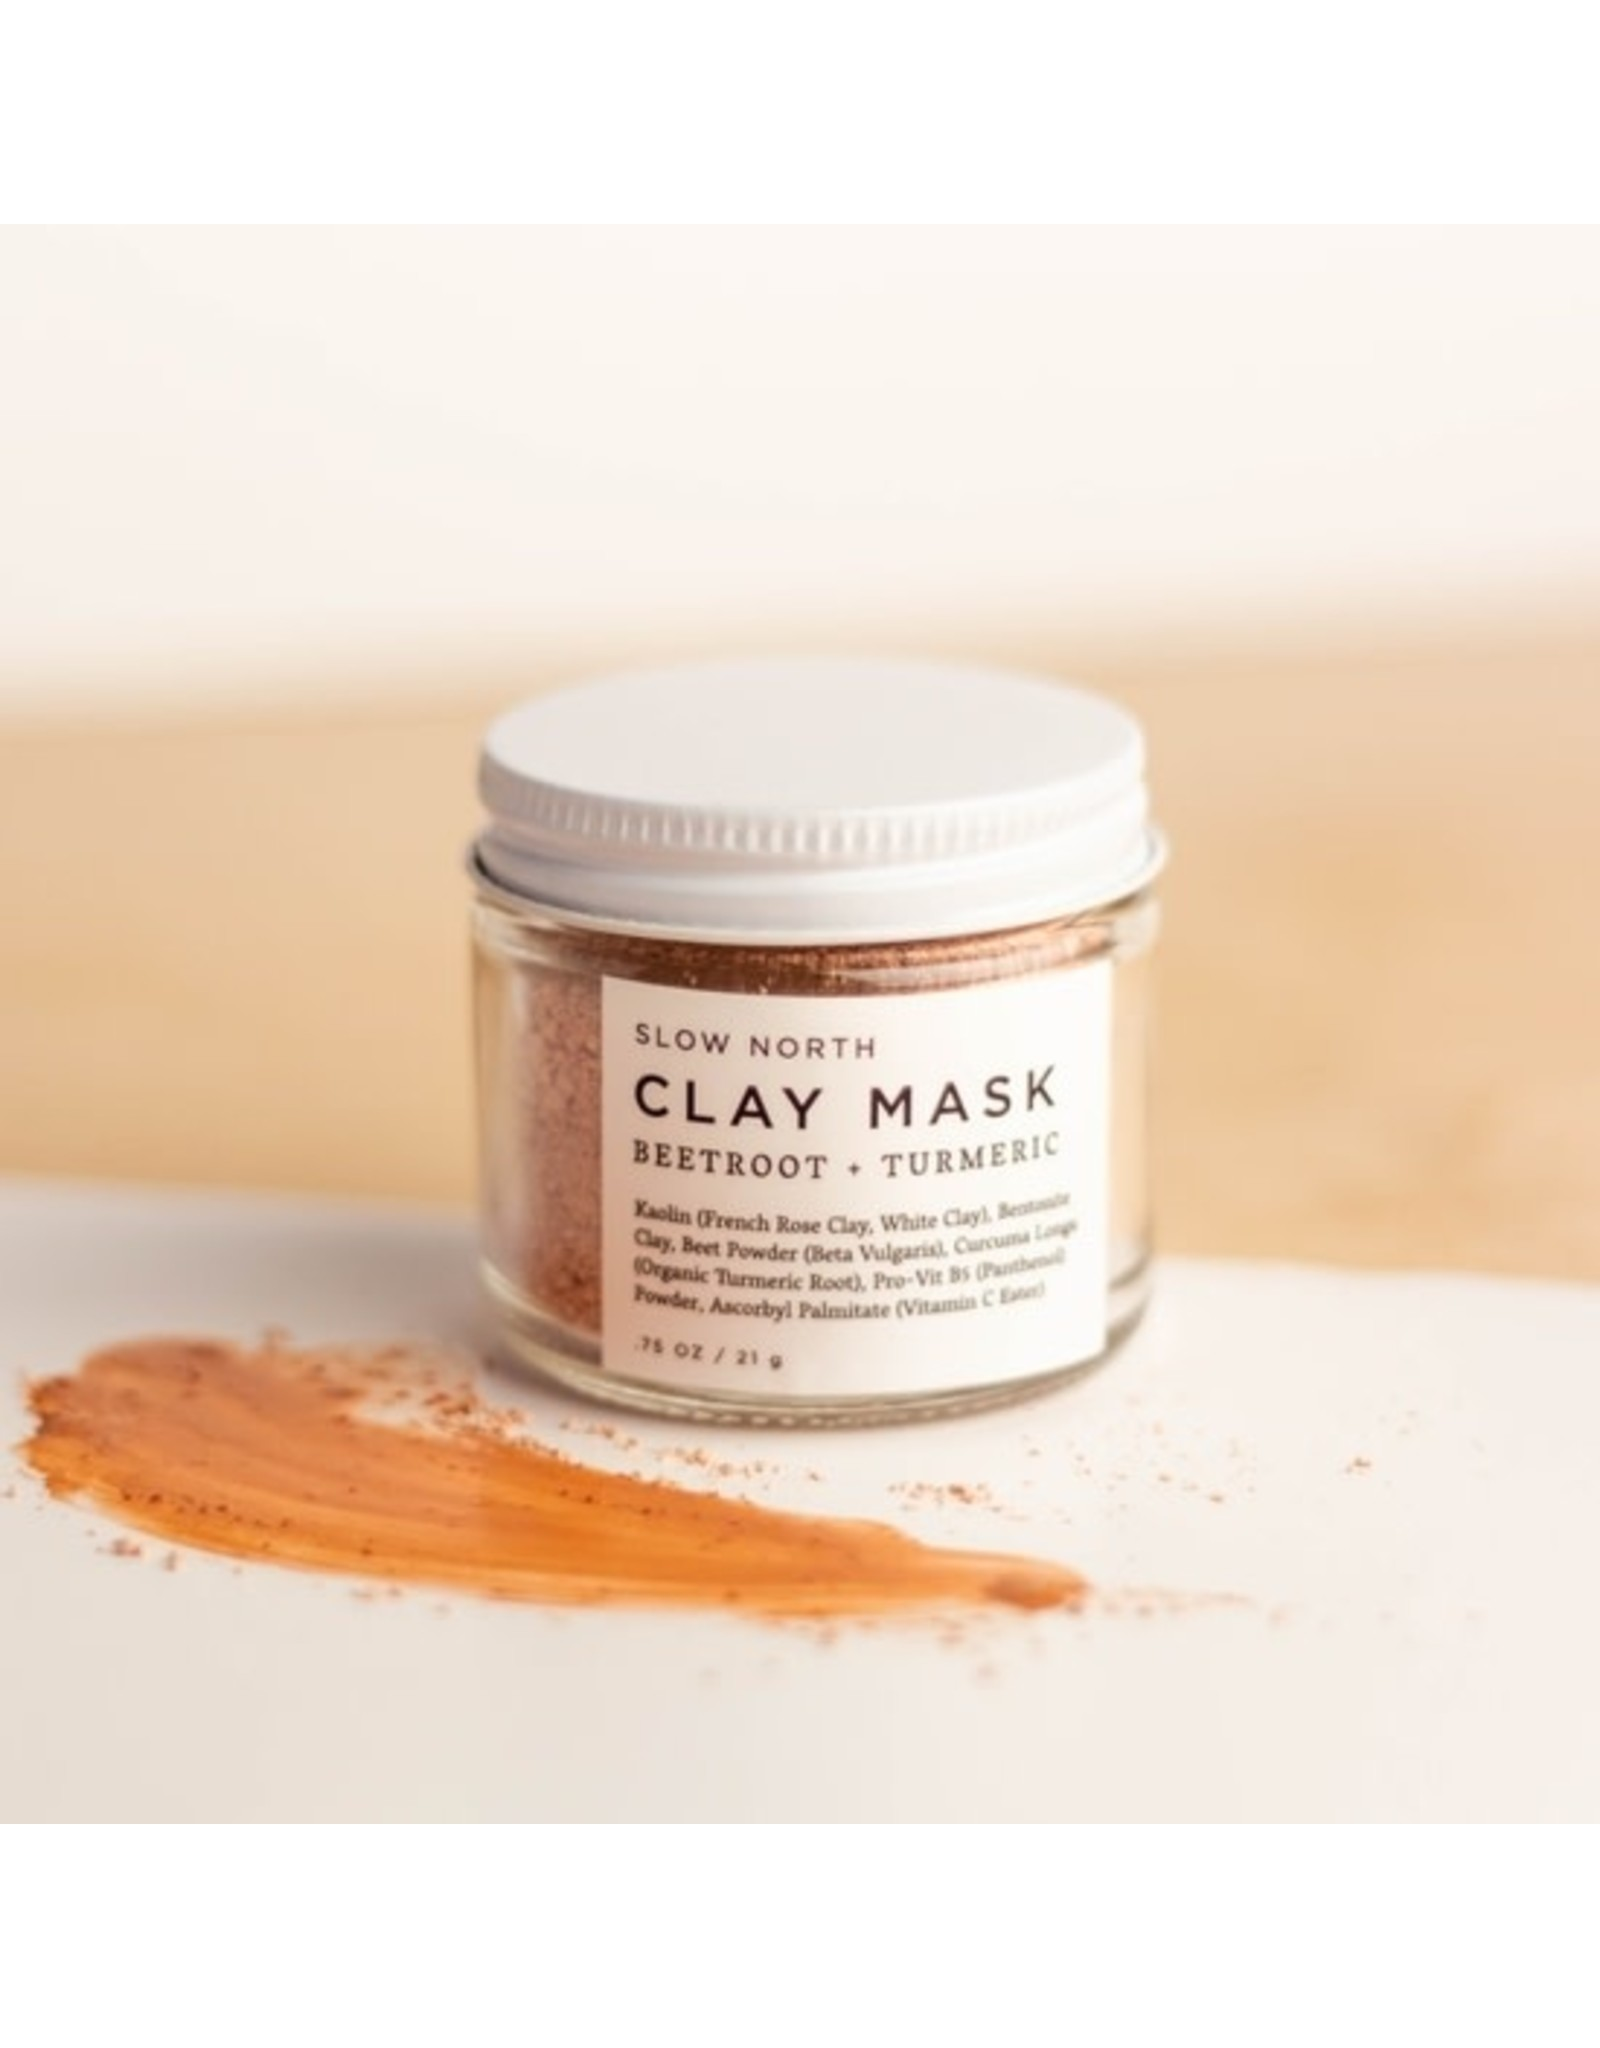 Beetroot + Tumeric Clay Mask